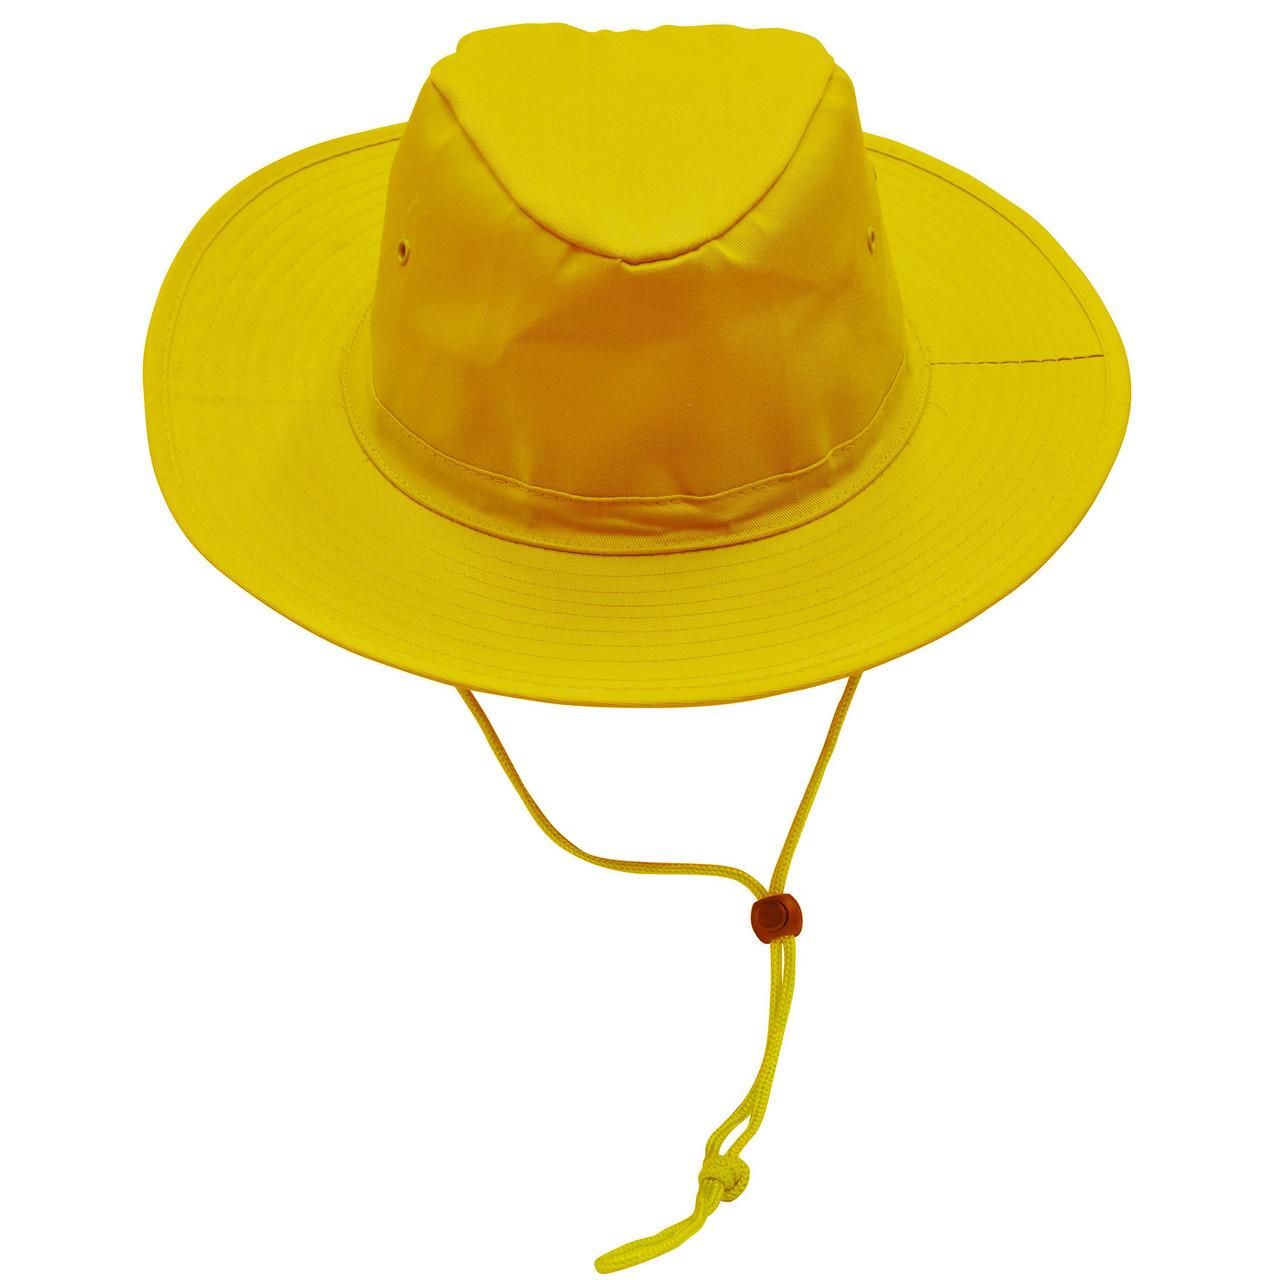 fcc8edac8040a7 SLOUCH HATS | wide brim firm hat | buy hats online | plain beach clothing